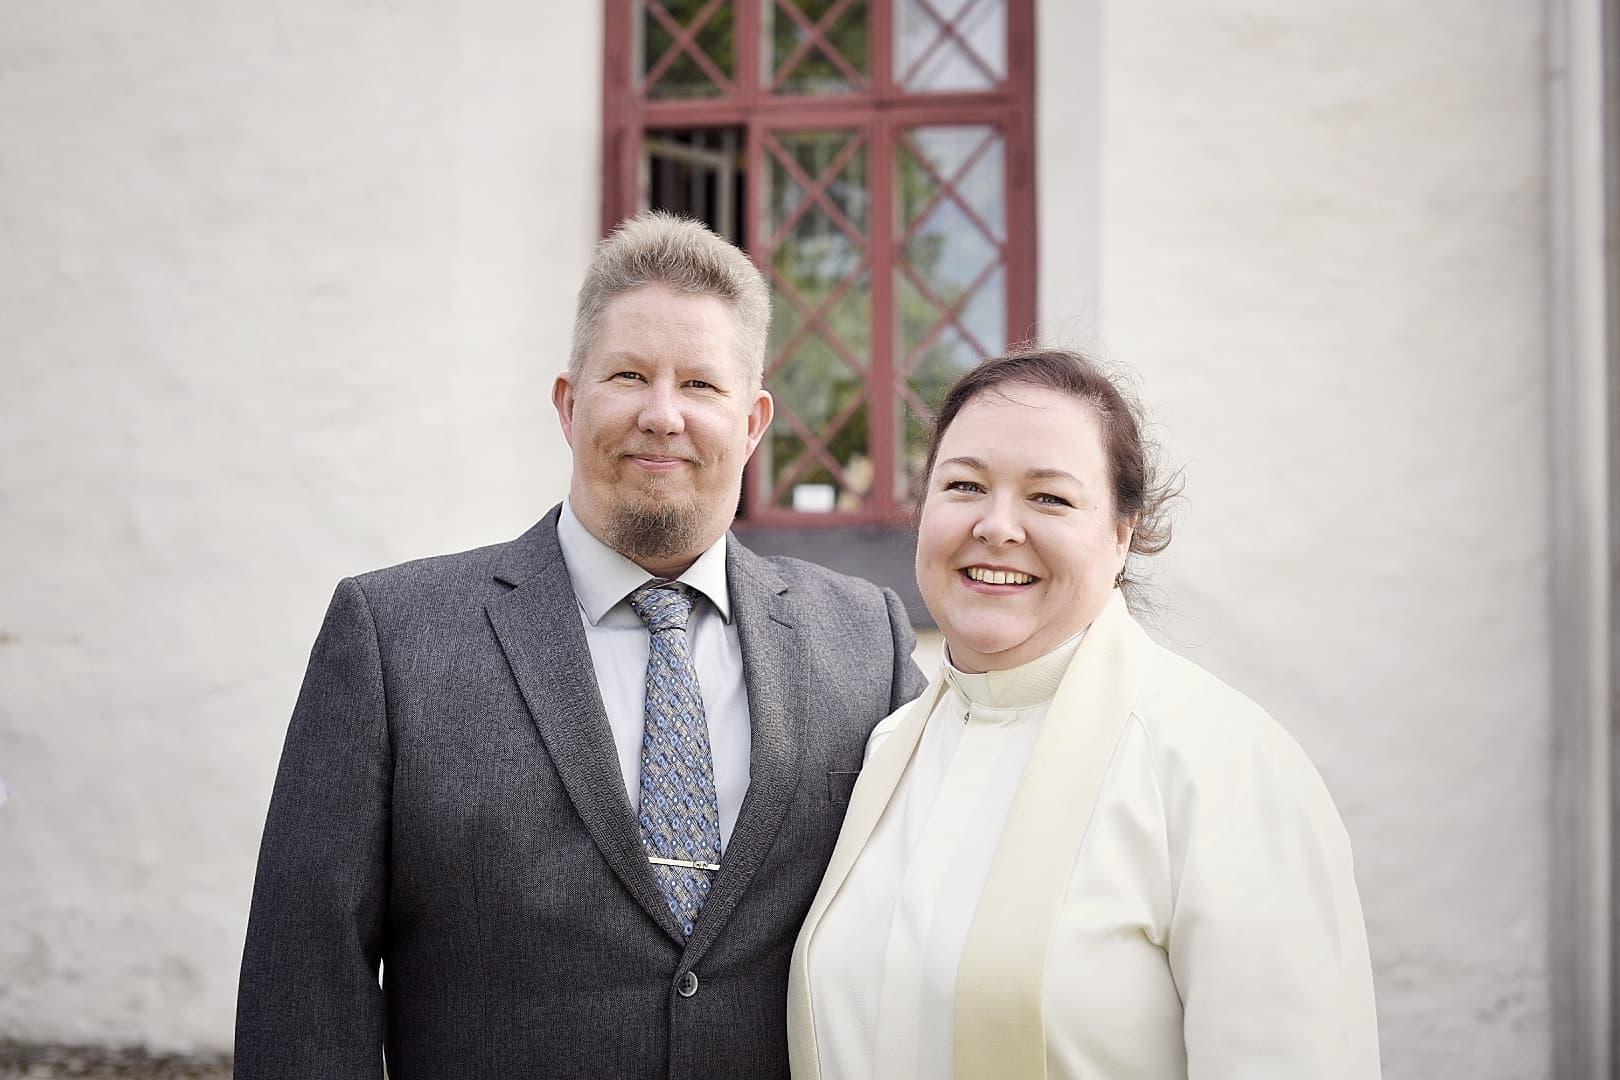 Janette och hennes man